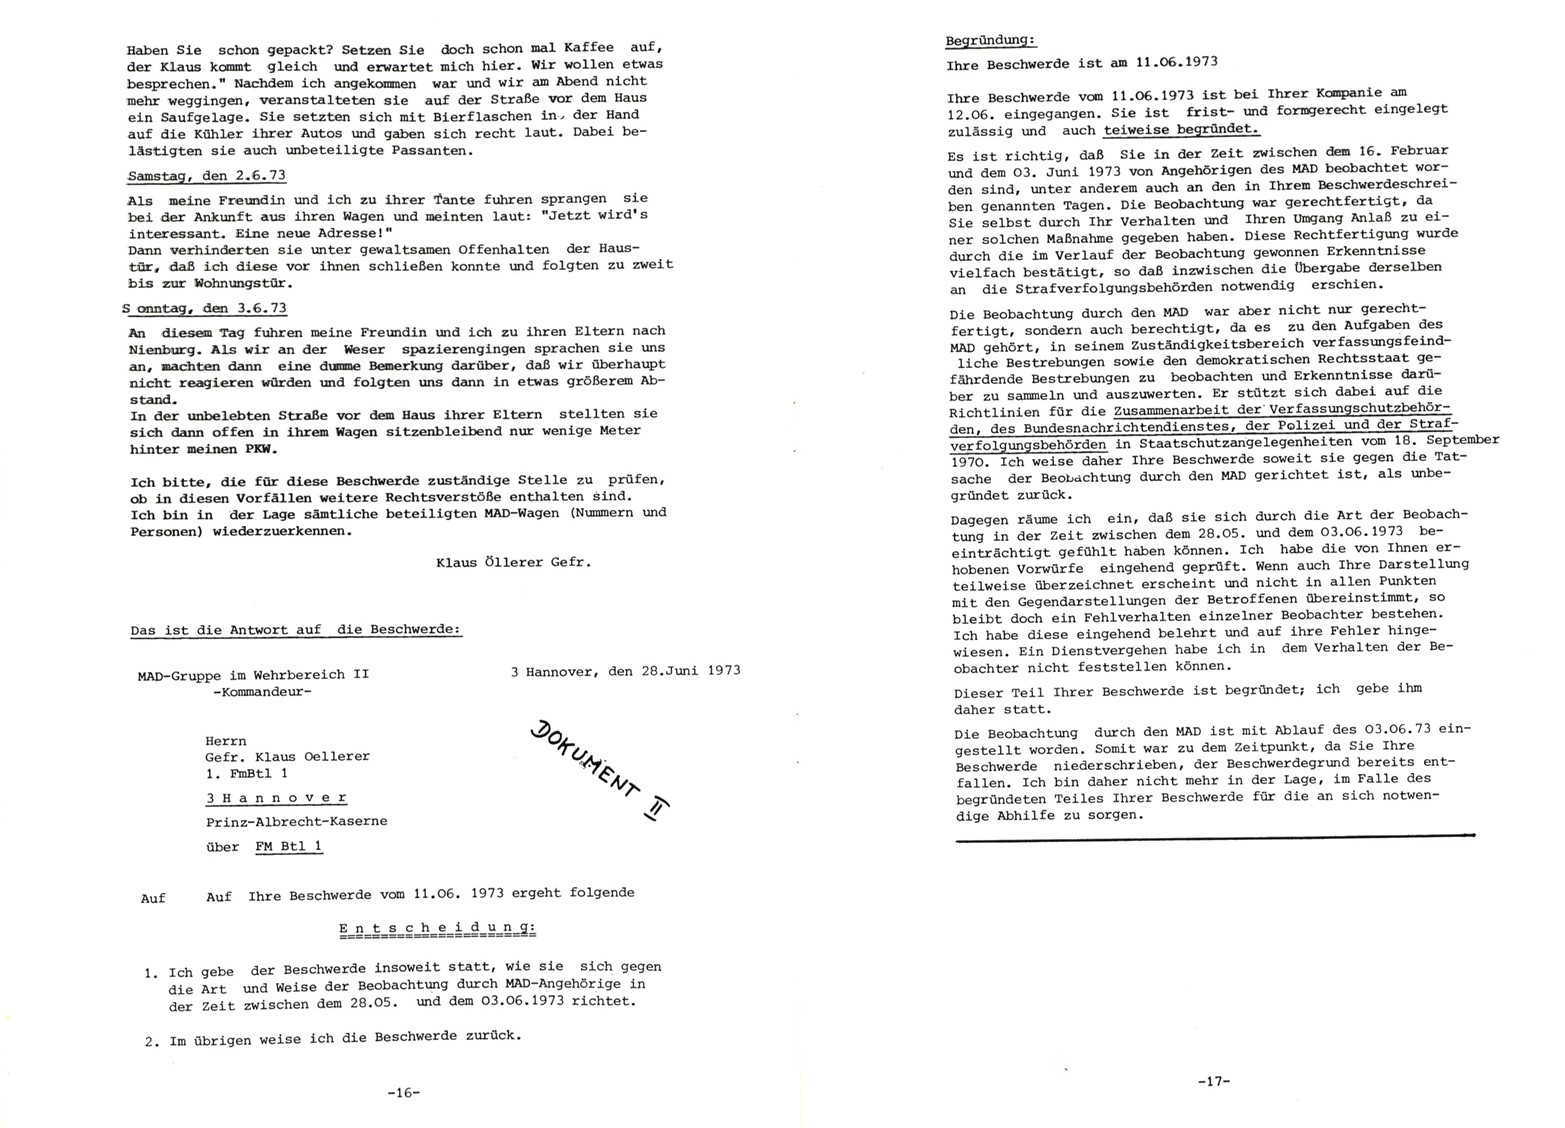 KPDAO_1976_Staatsschutzparagrafen_09